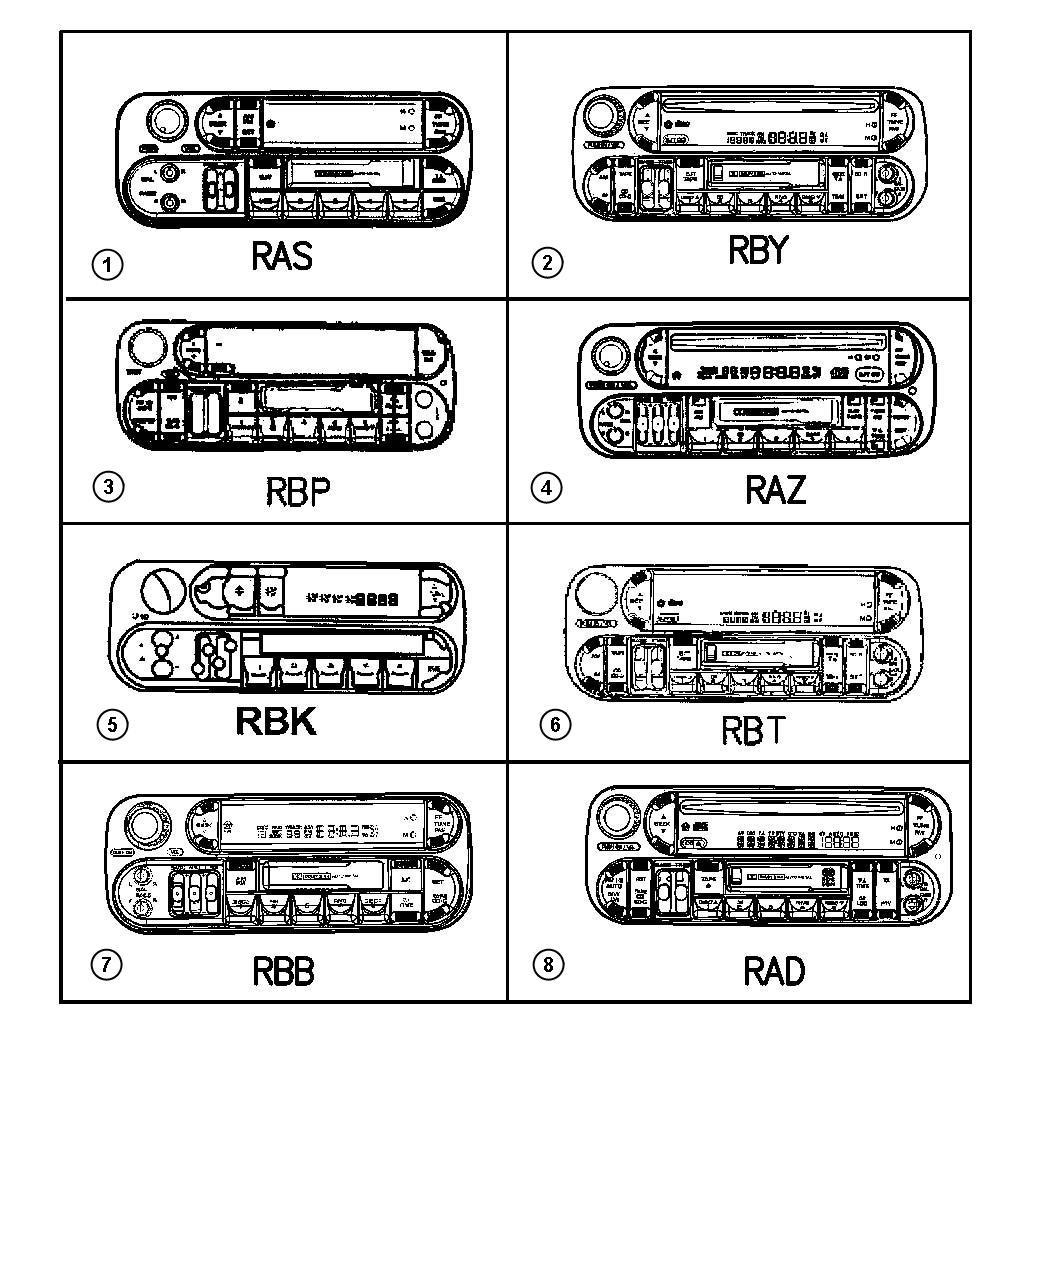 00i46269 Radio Wiring Diagram Dodge Intrepid on ram 3500 parts, ram 1500 trailer, ram 1500 engine, ram 1500 ac, dakota heater, ram hemi ecm, ram 3500 cummins, ram brake, ram diesel, durango stereo,